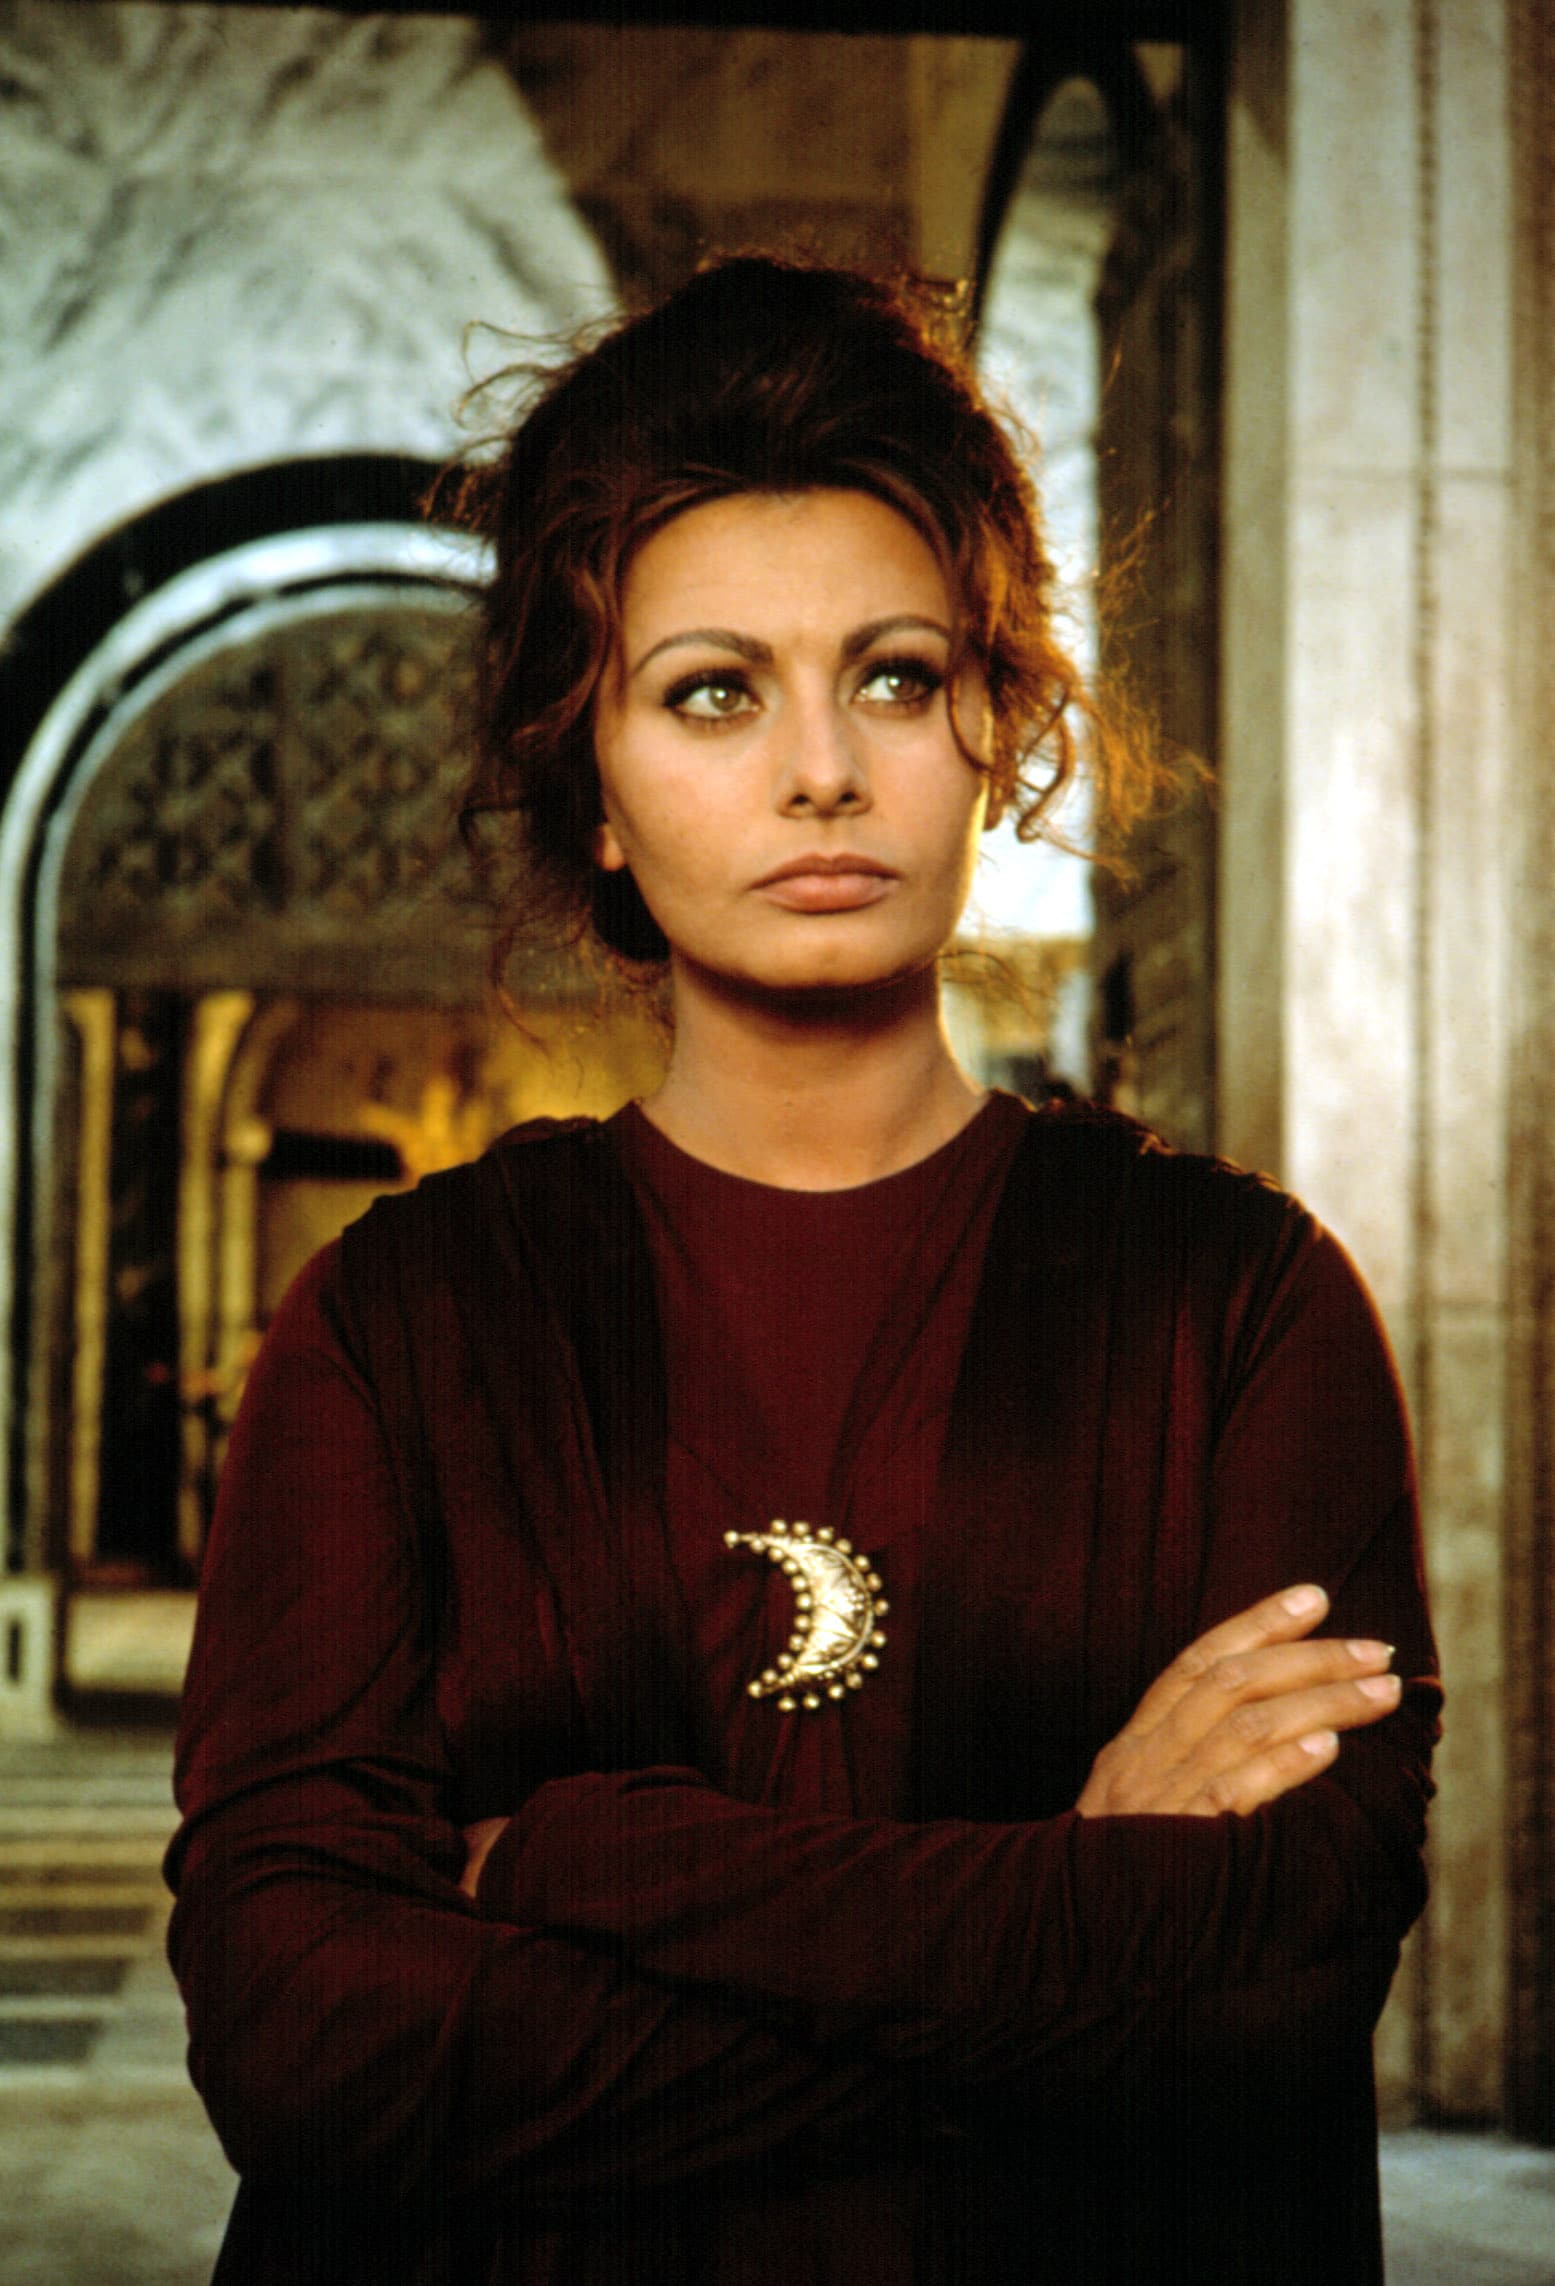 THE FALL OF THE ROMAN EMPIRE, Sophia Loren, 1964